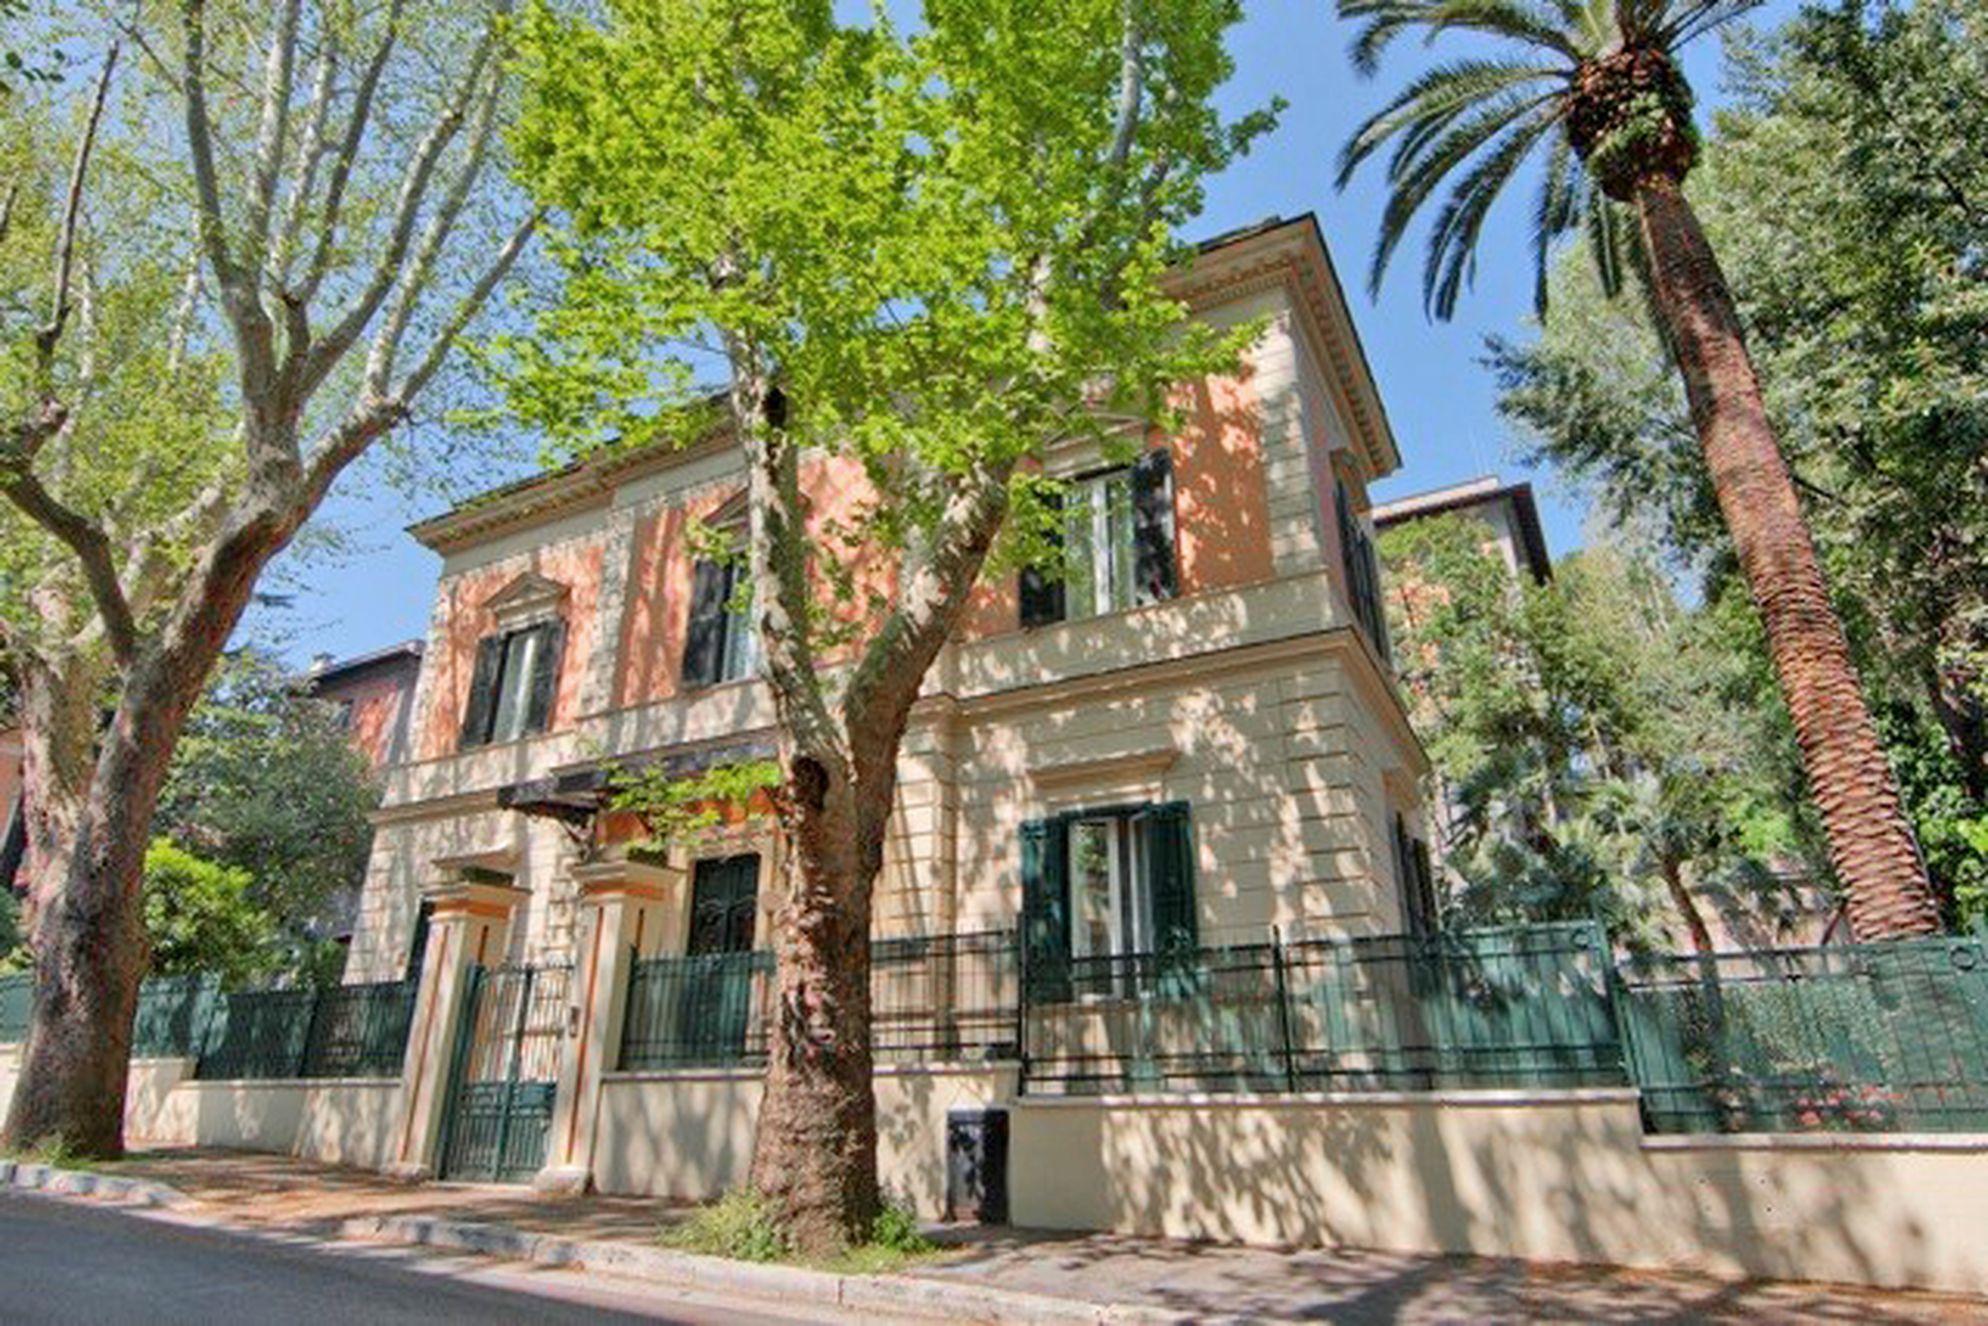 Villa Urbani - Gallery